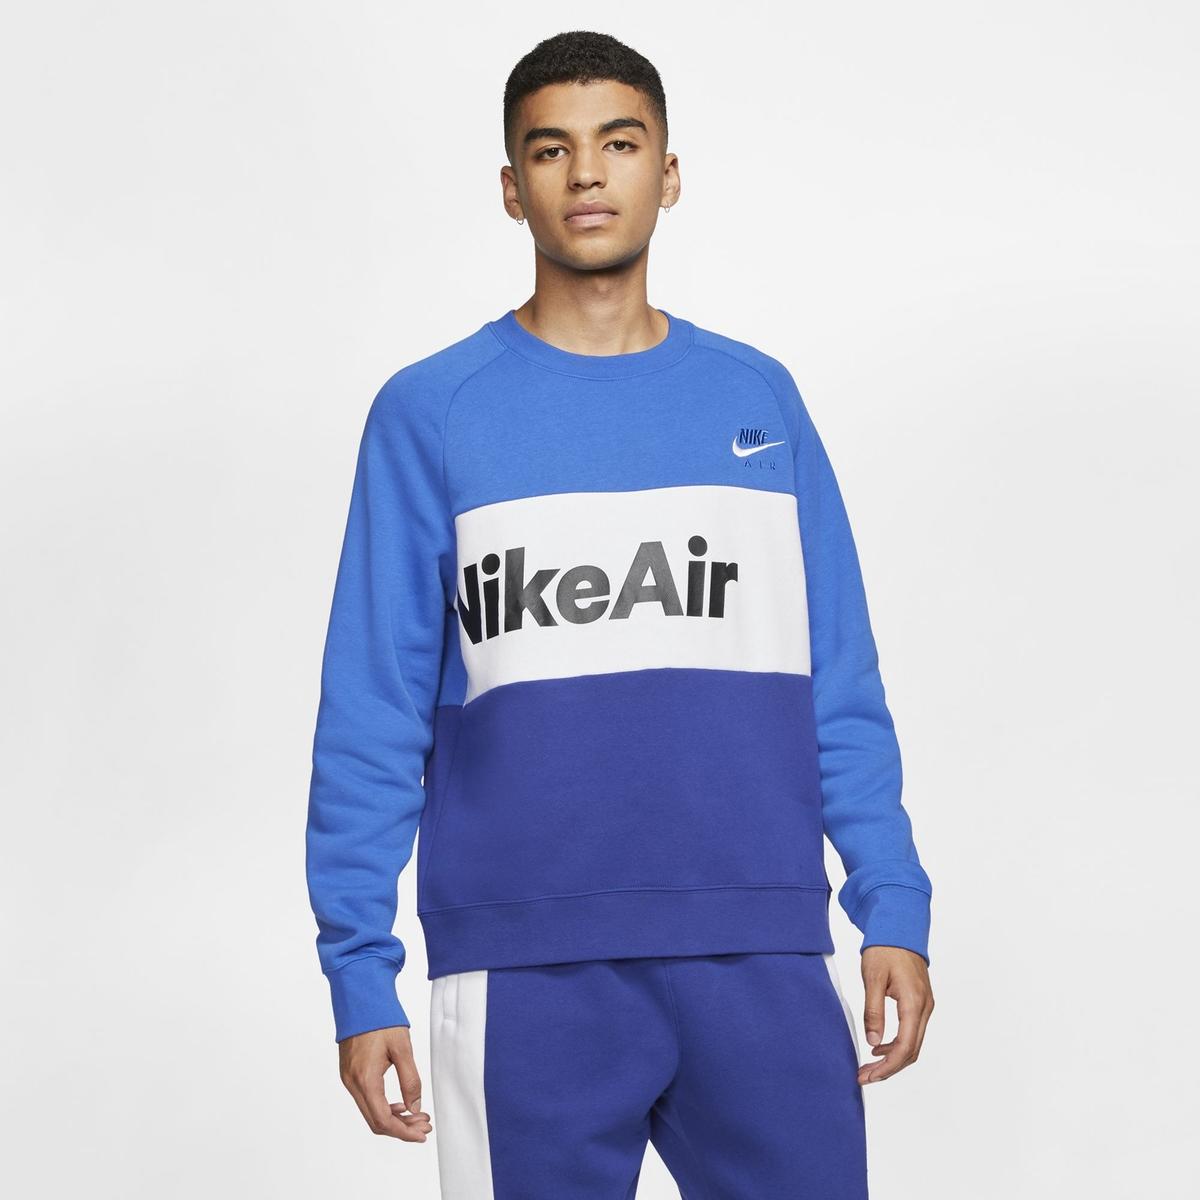 Sudadera con cuello redondo Nike Air